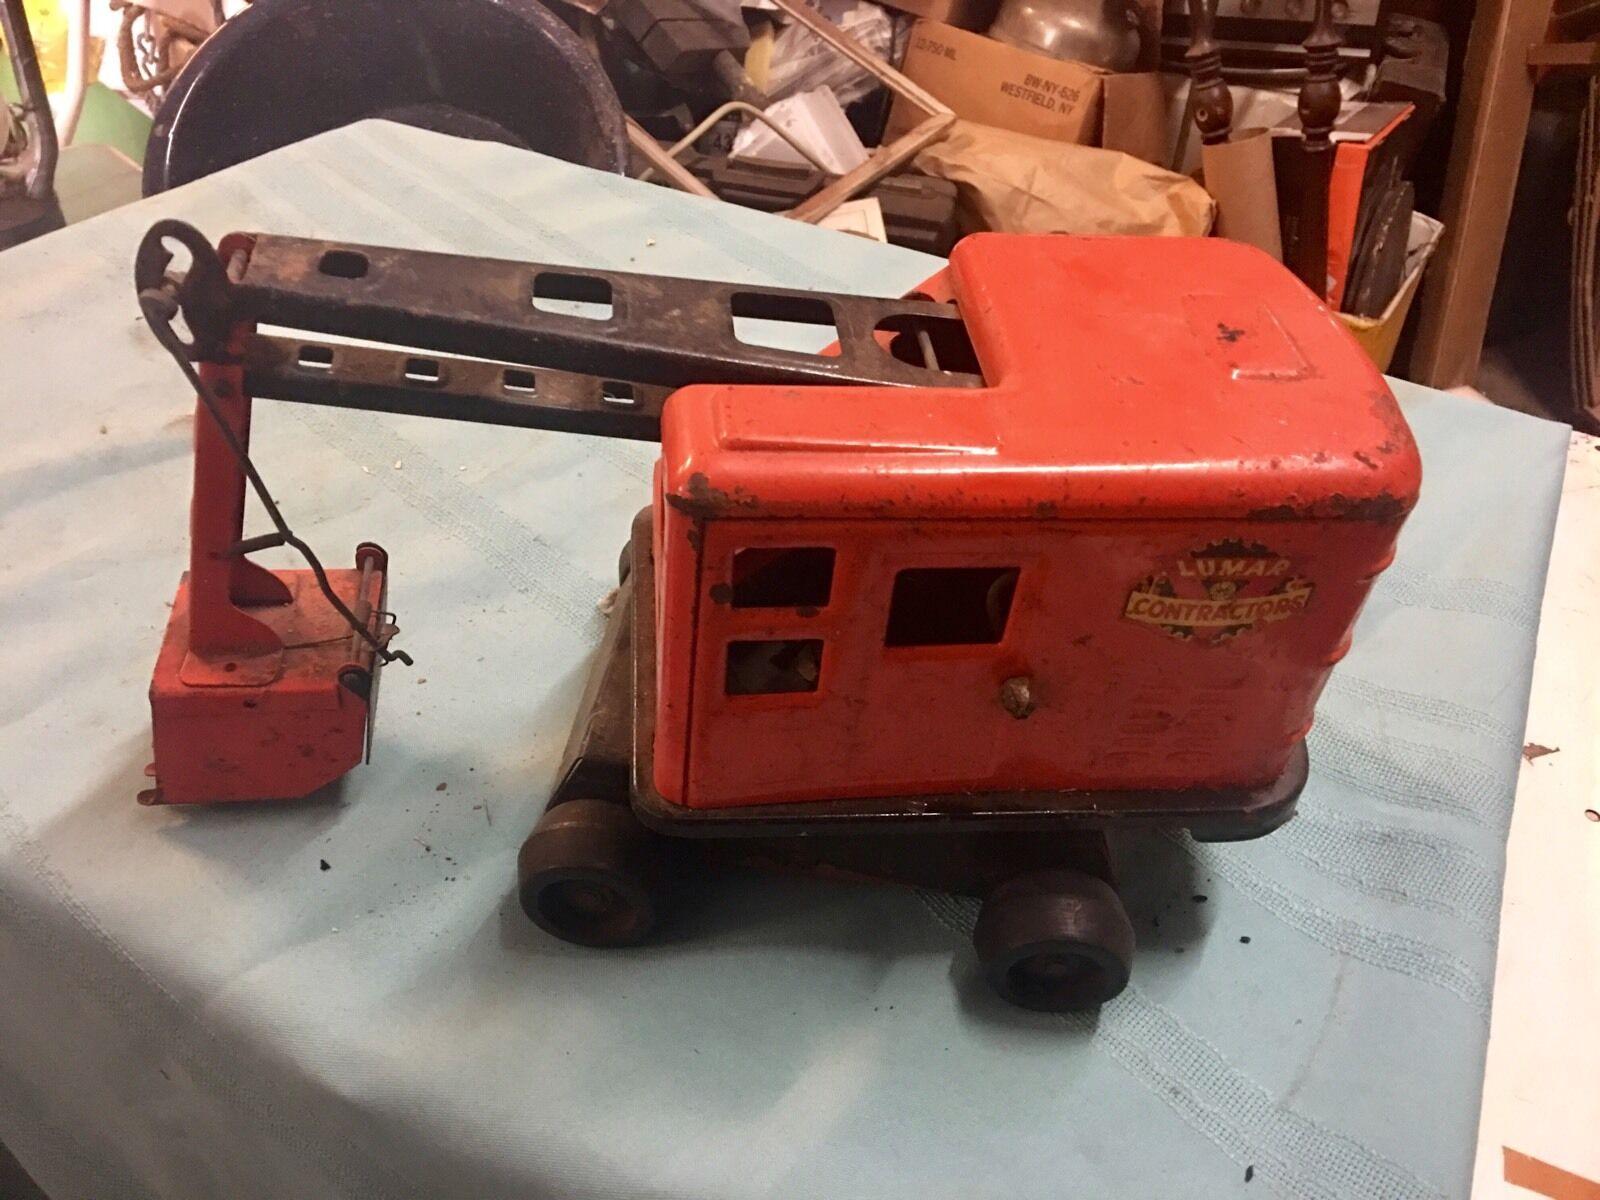 Original OLD Lumar Contractors TOY Shovel Excavator Look  Don't Miss This